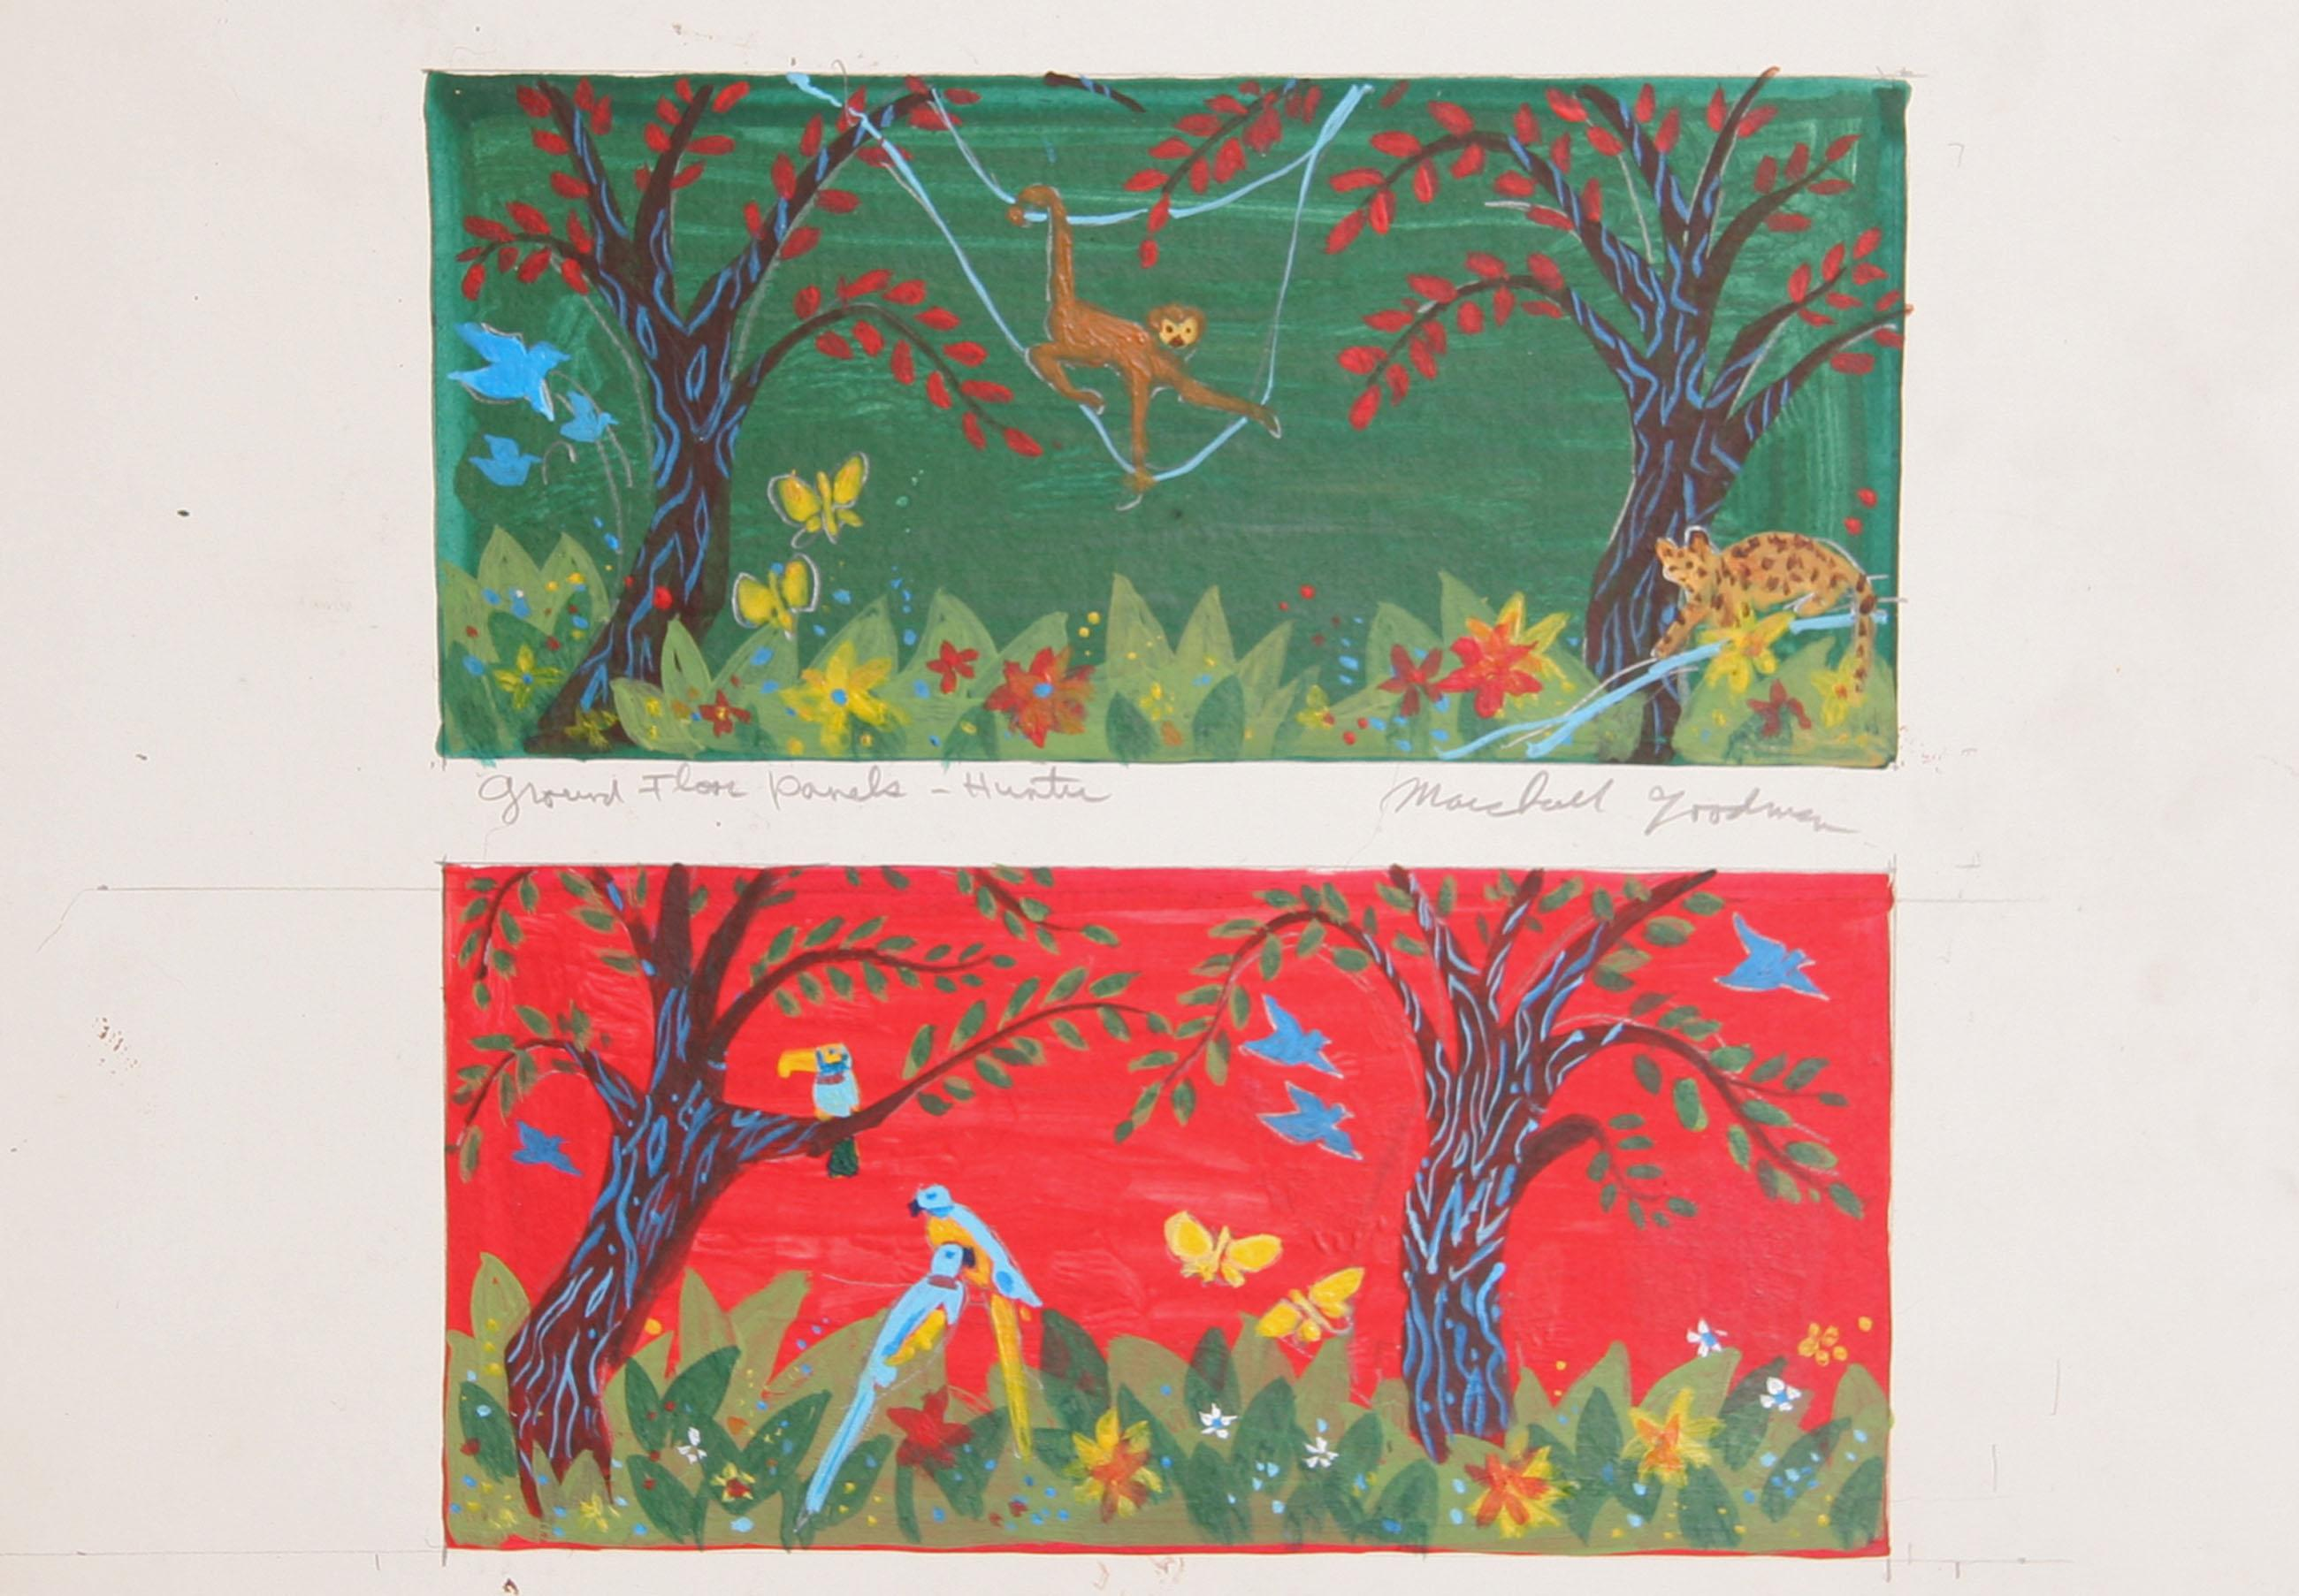 Marshall Goodman, Rainforest Ground Floor Panels - Hunter, Acrylic Painting